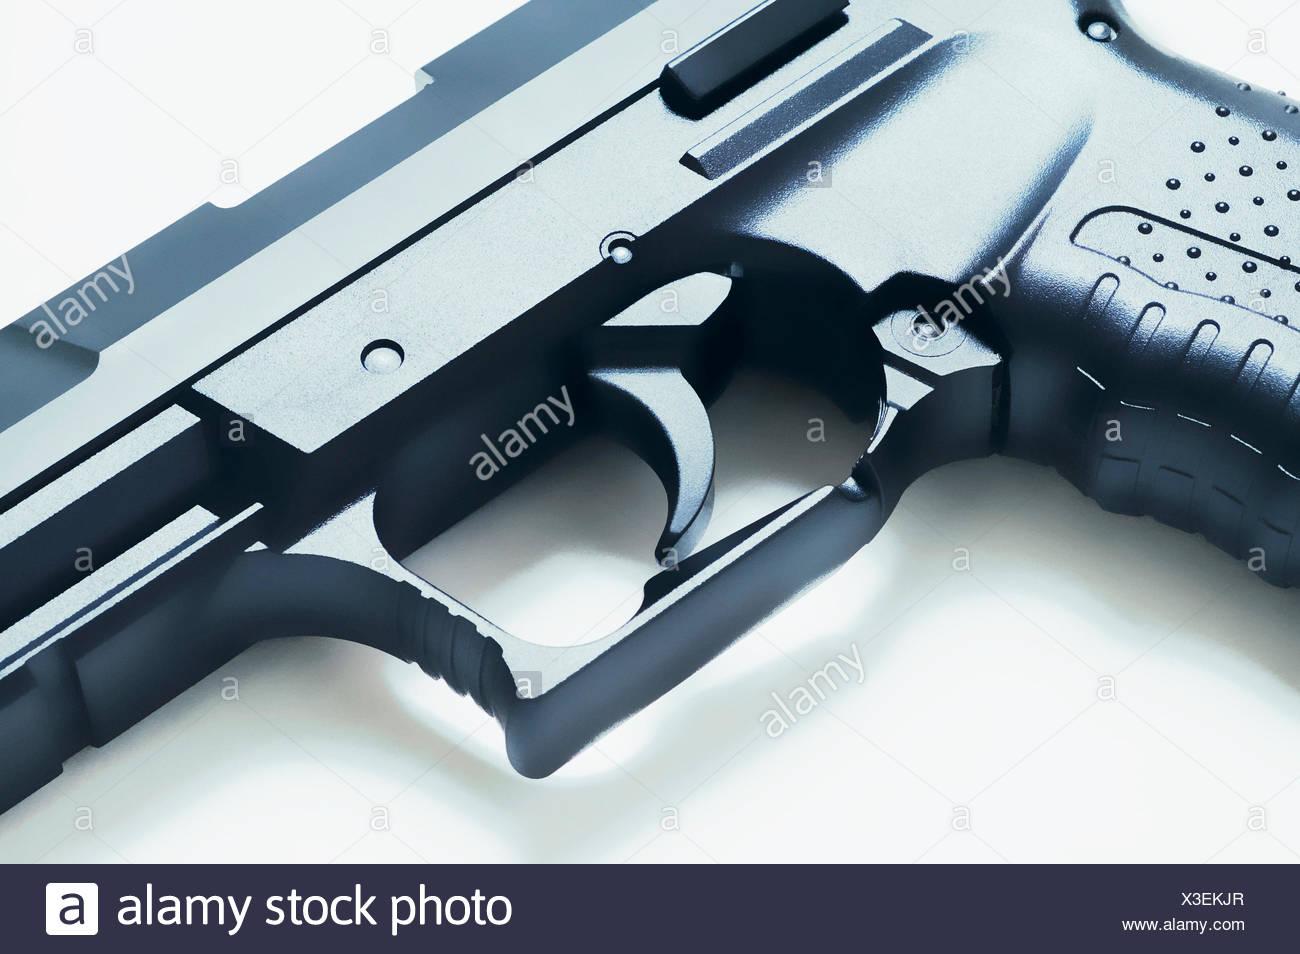 Close-up of trigger on a handgun - Stock Image